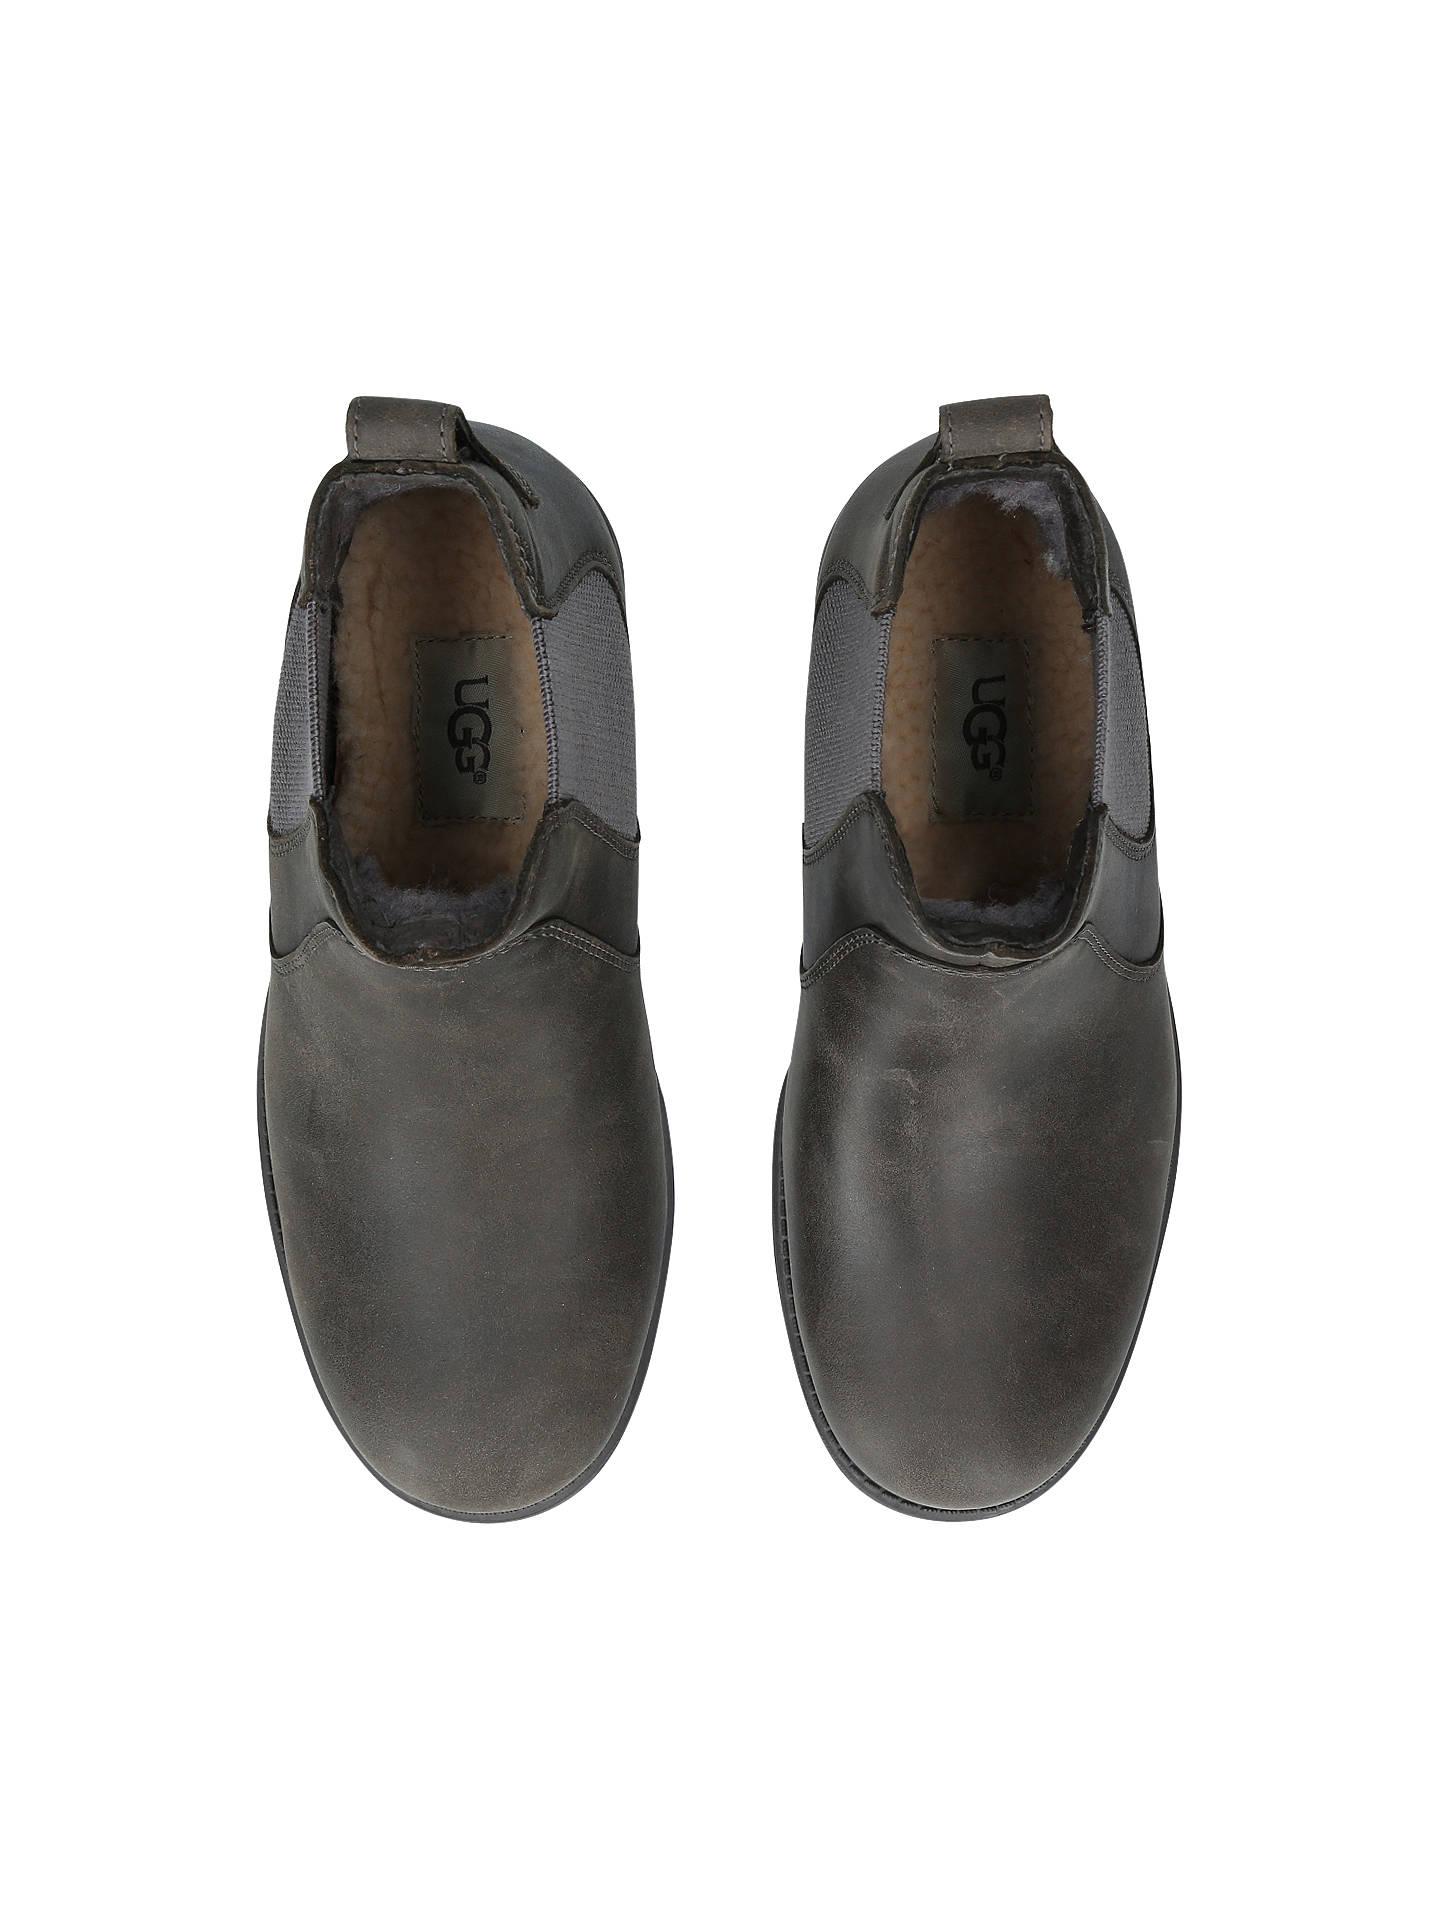 b6822ae1cc2 UGG Bonham Leather Low Block Heel Ankle Boots at John Lewis & Partners